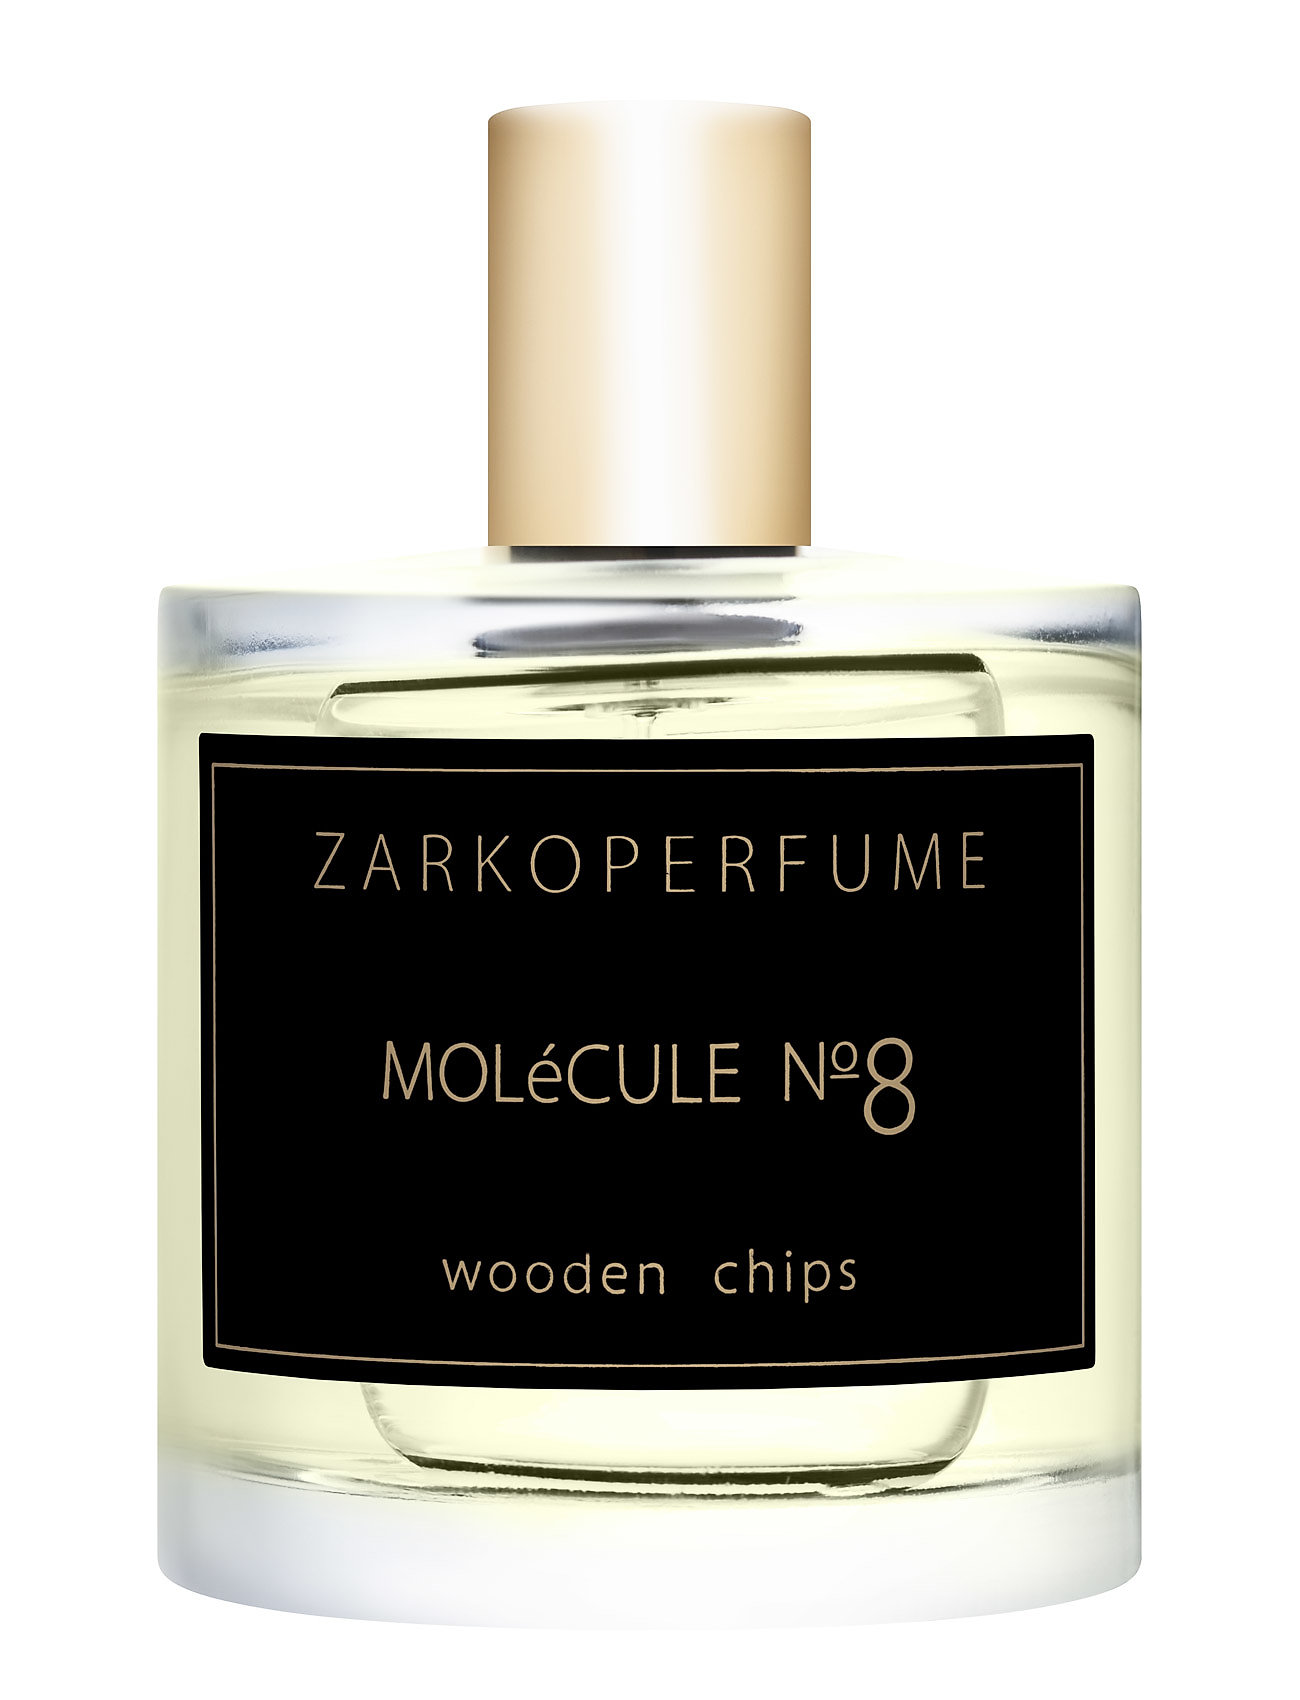 Molã©cule no.8 - eau de parfum fra zarkoperfume fra boozt.com dk